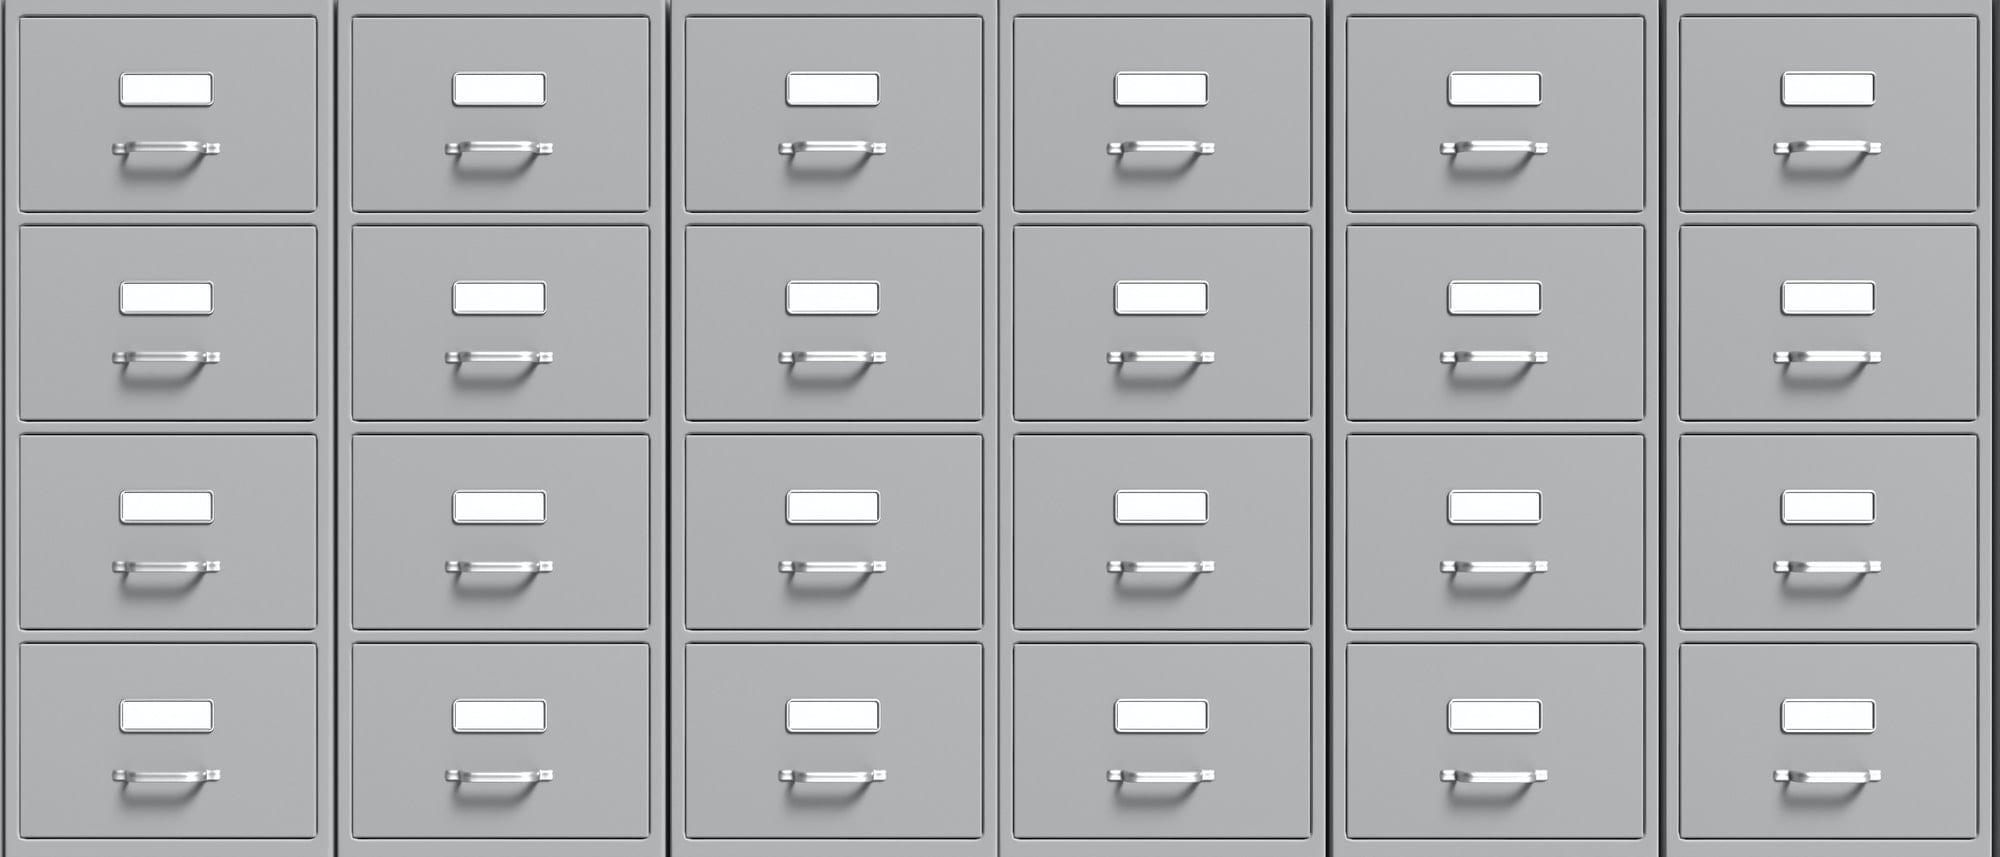 Filing cabinets background. Office document file organisation. 3d illustration